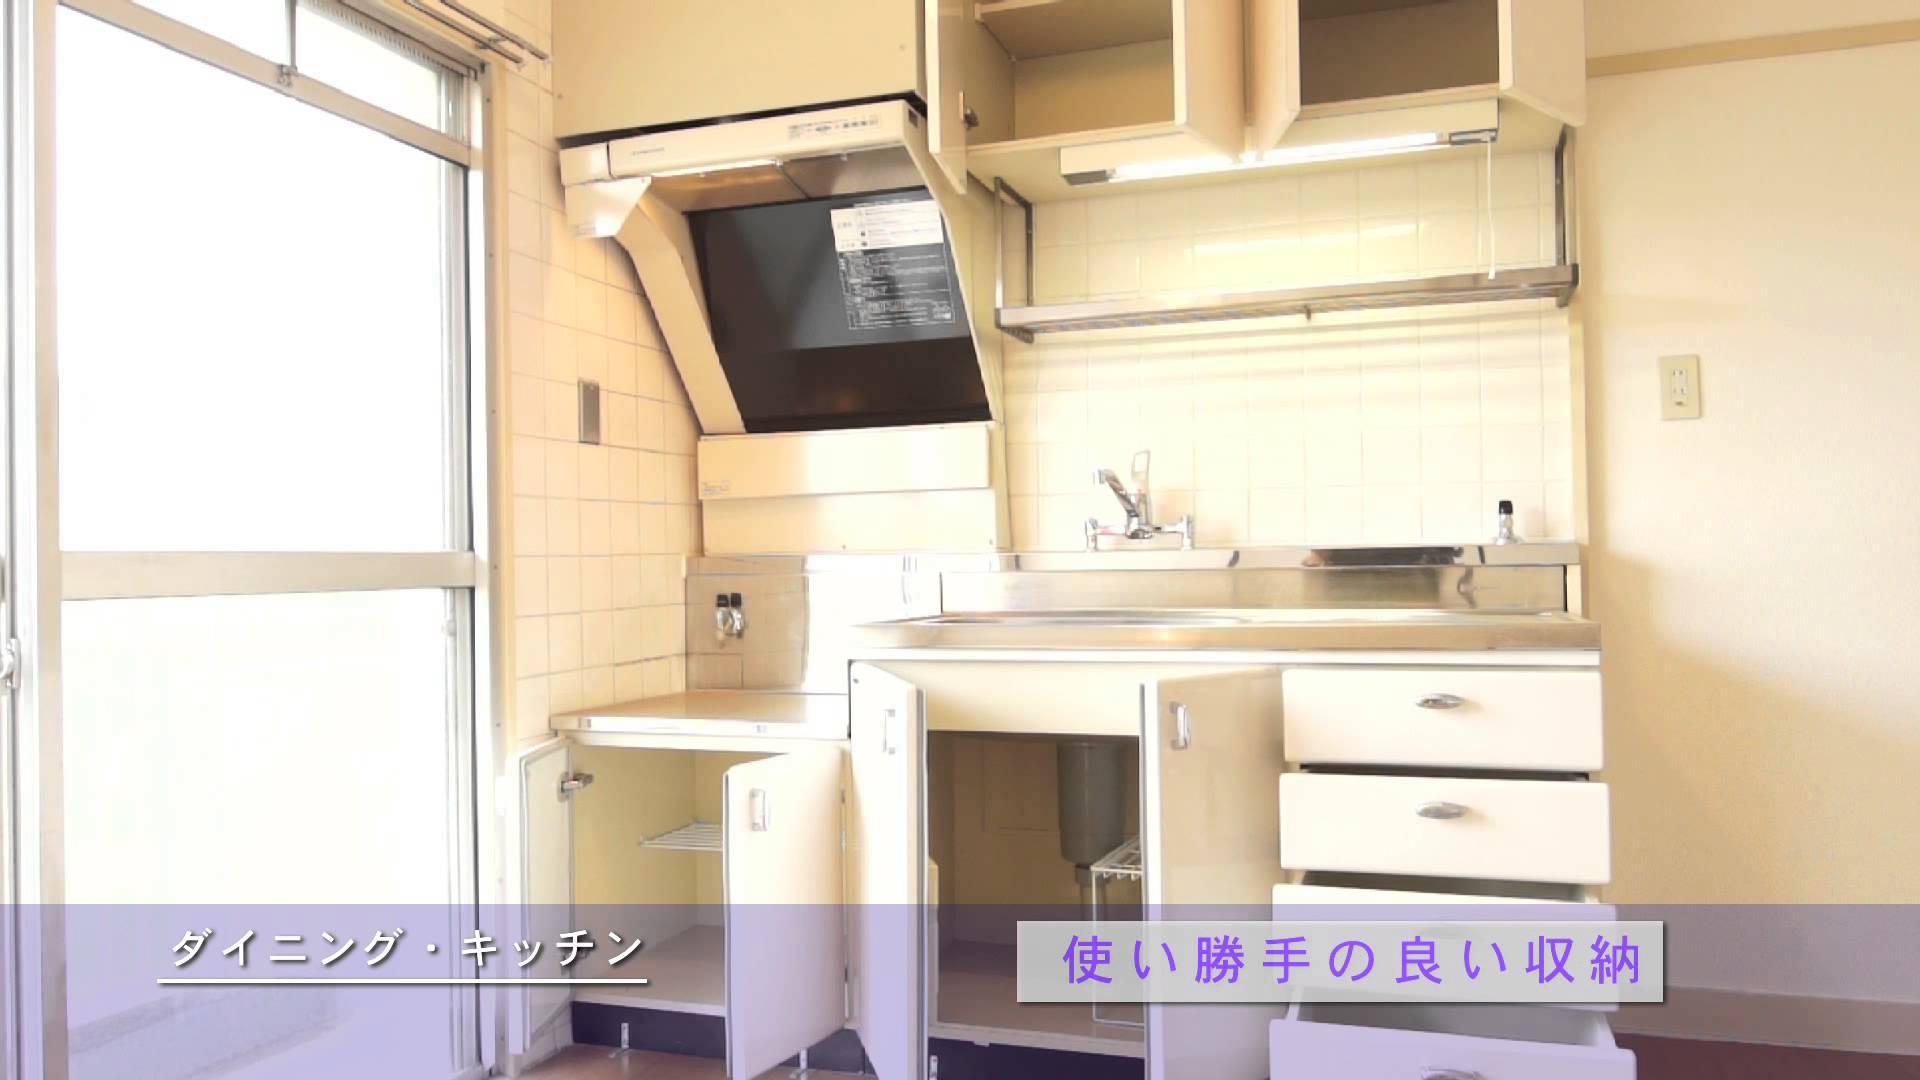 UR賃貸住宅 戸頭団地 部屋タイプ3E 室内紹介